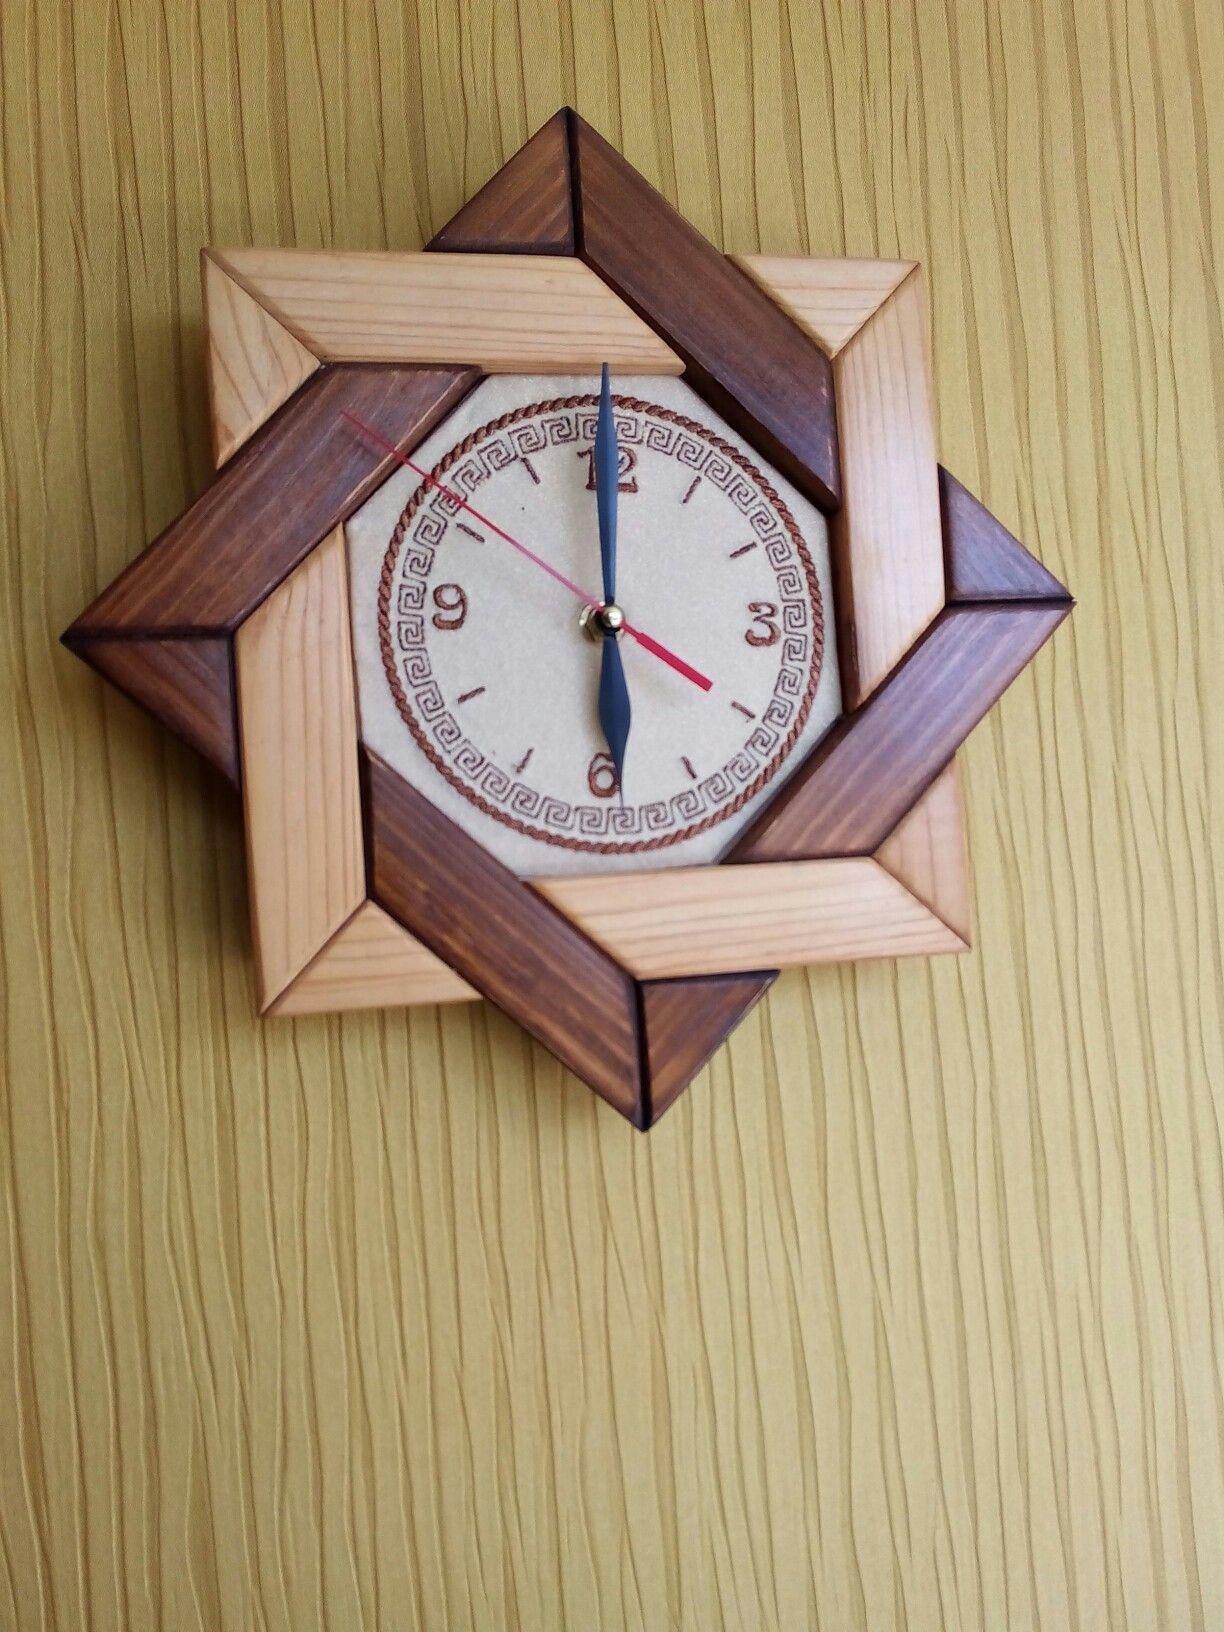 Cool wall clock